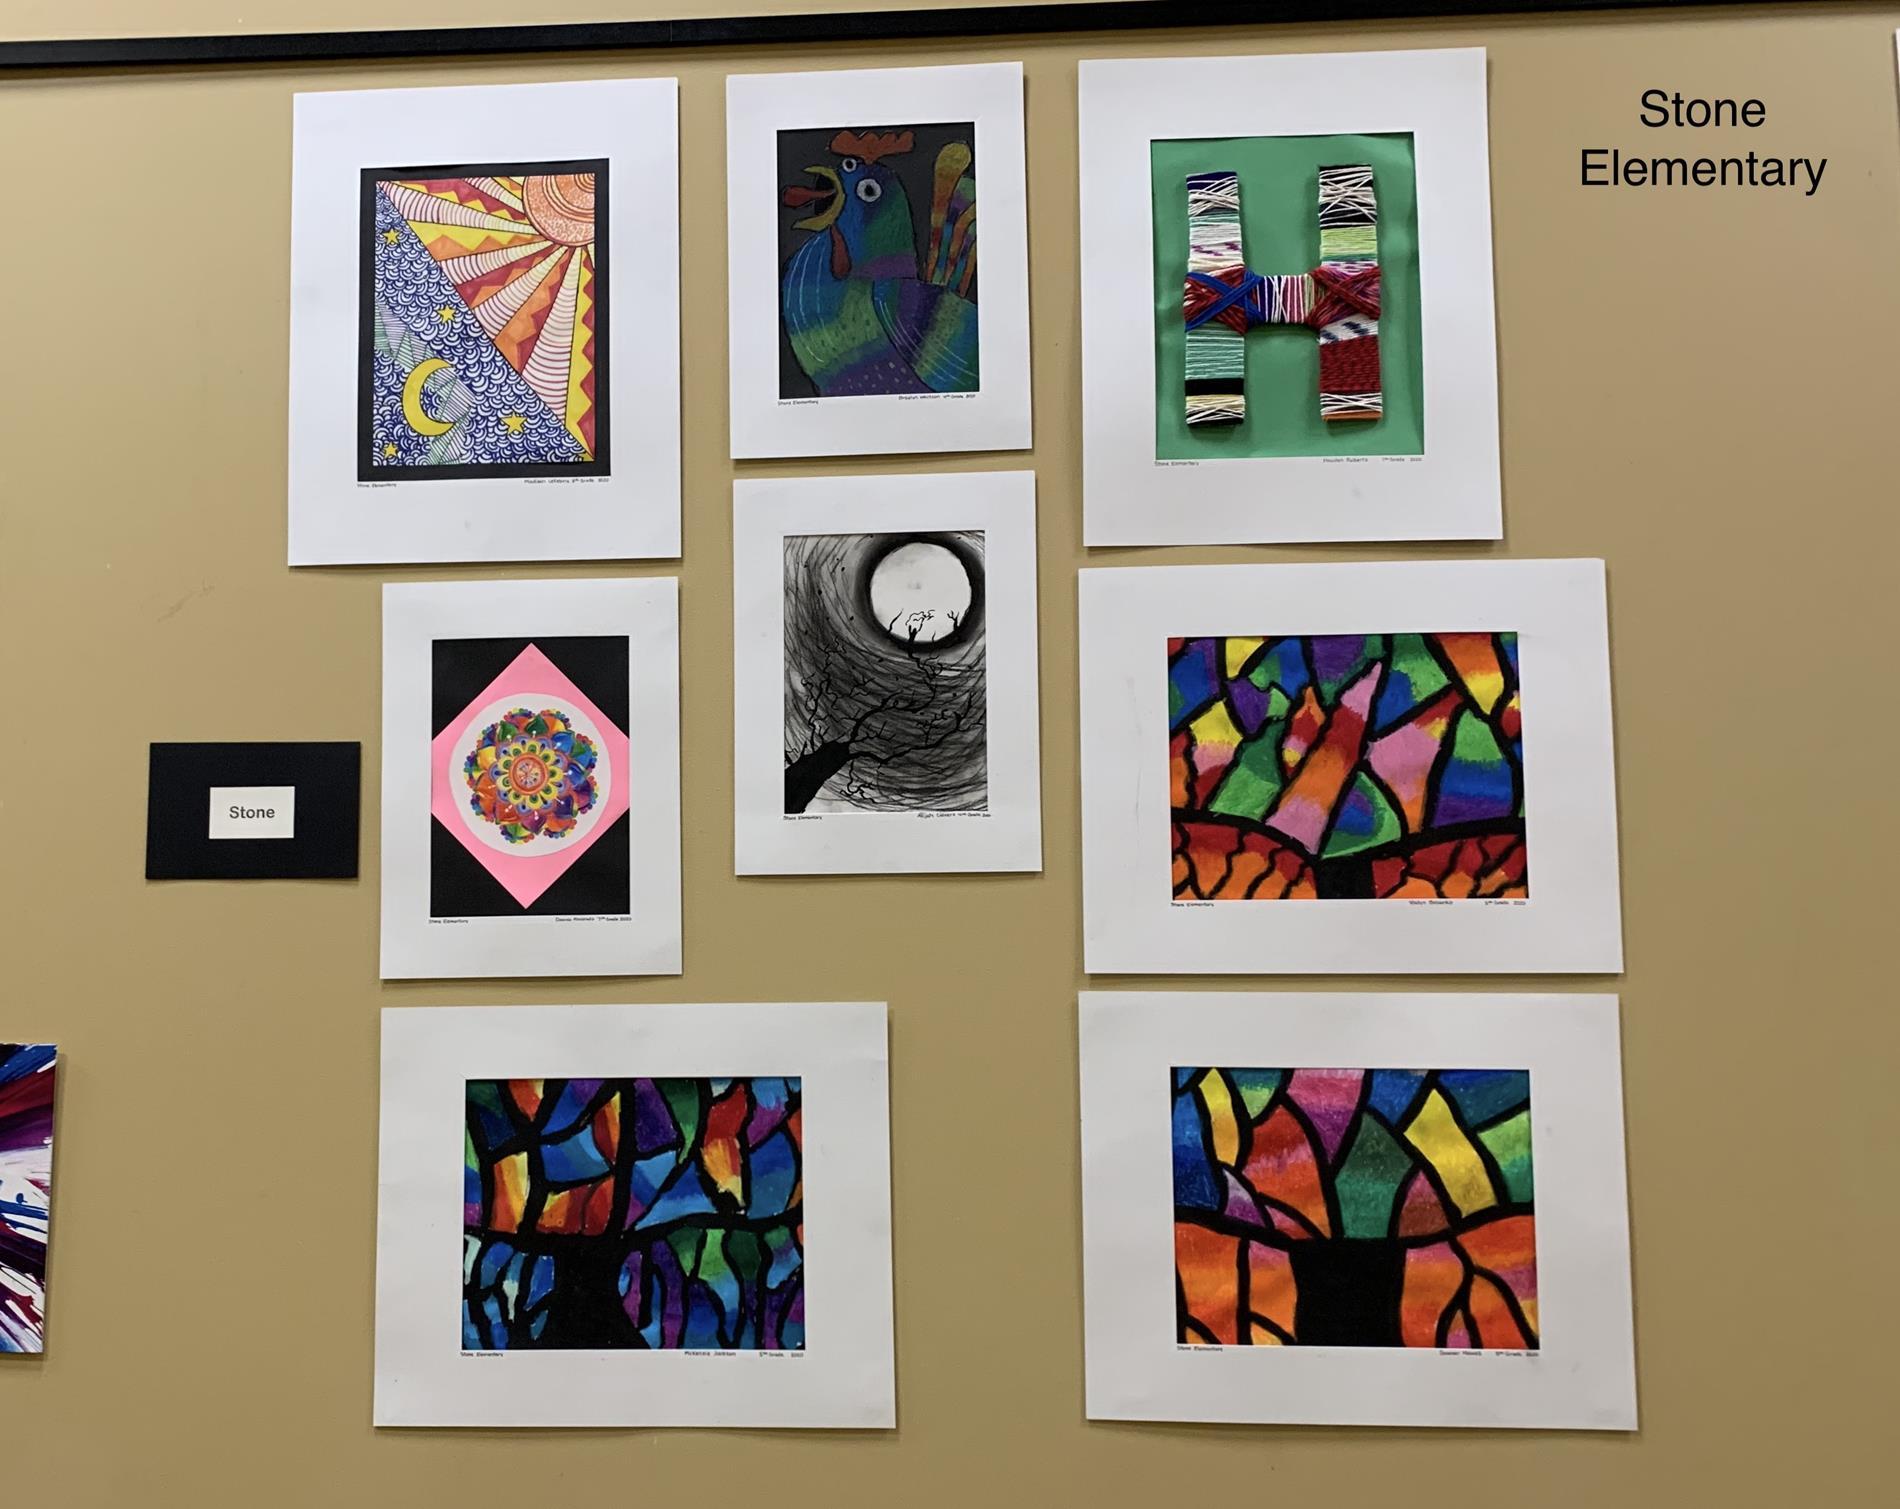 Stone Elementary Art Work